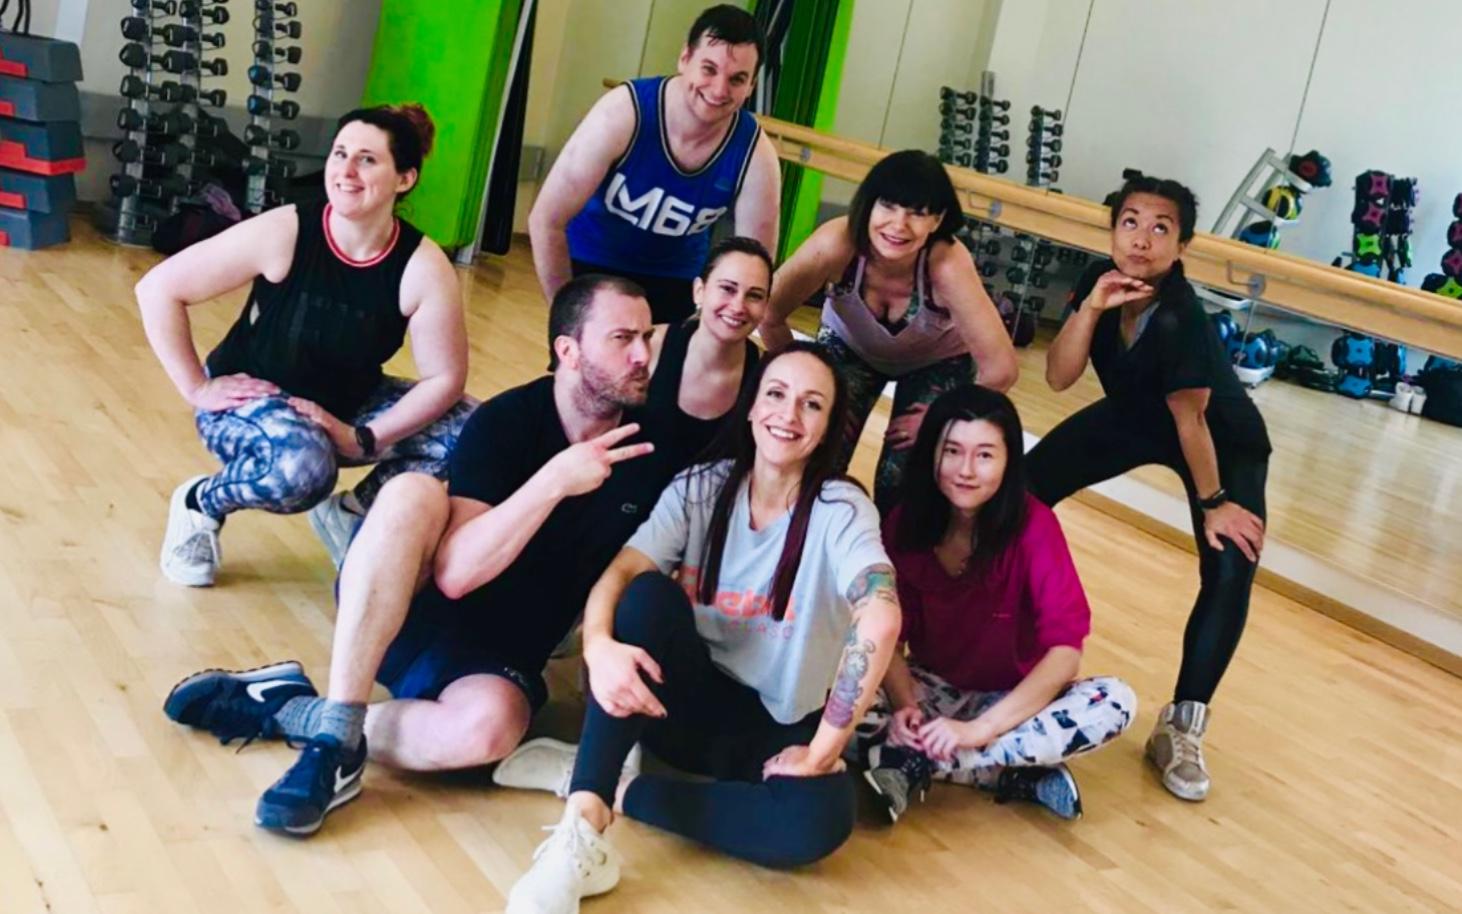 英國萊美有氧舞蹈Bodyjam89培訓 | 英文視頻中文字幕_嗶哩嗶哩 (゜-゜)つロ 干杯~-bilibili